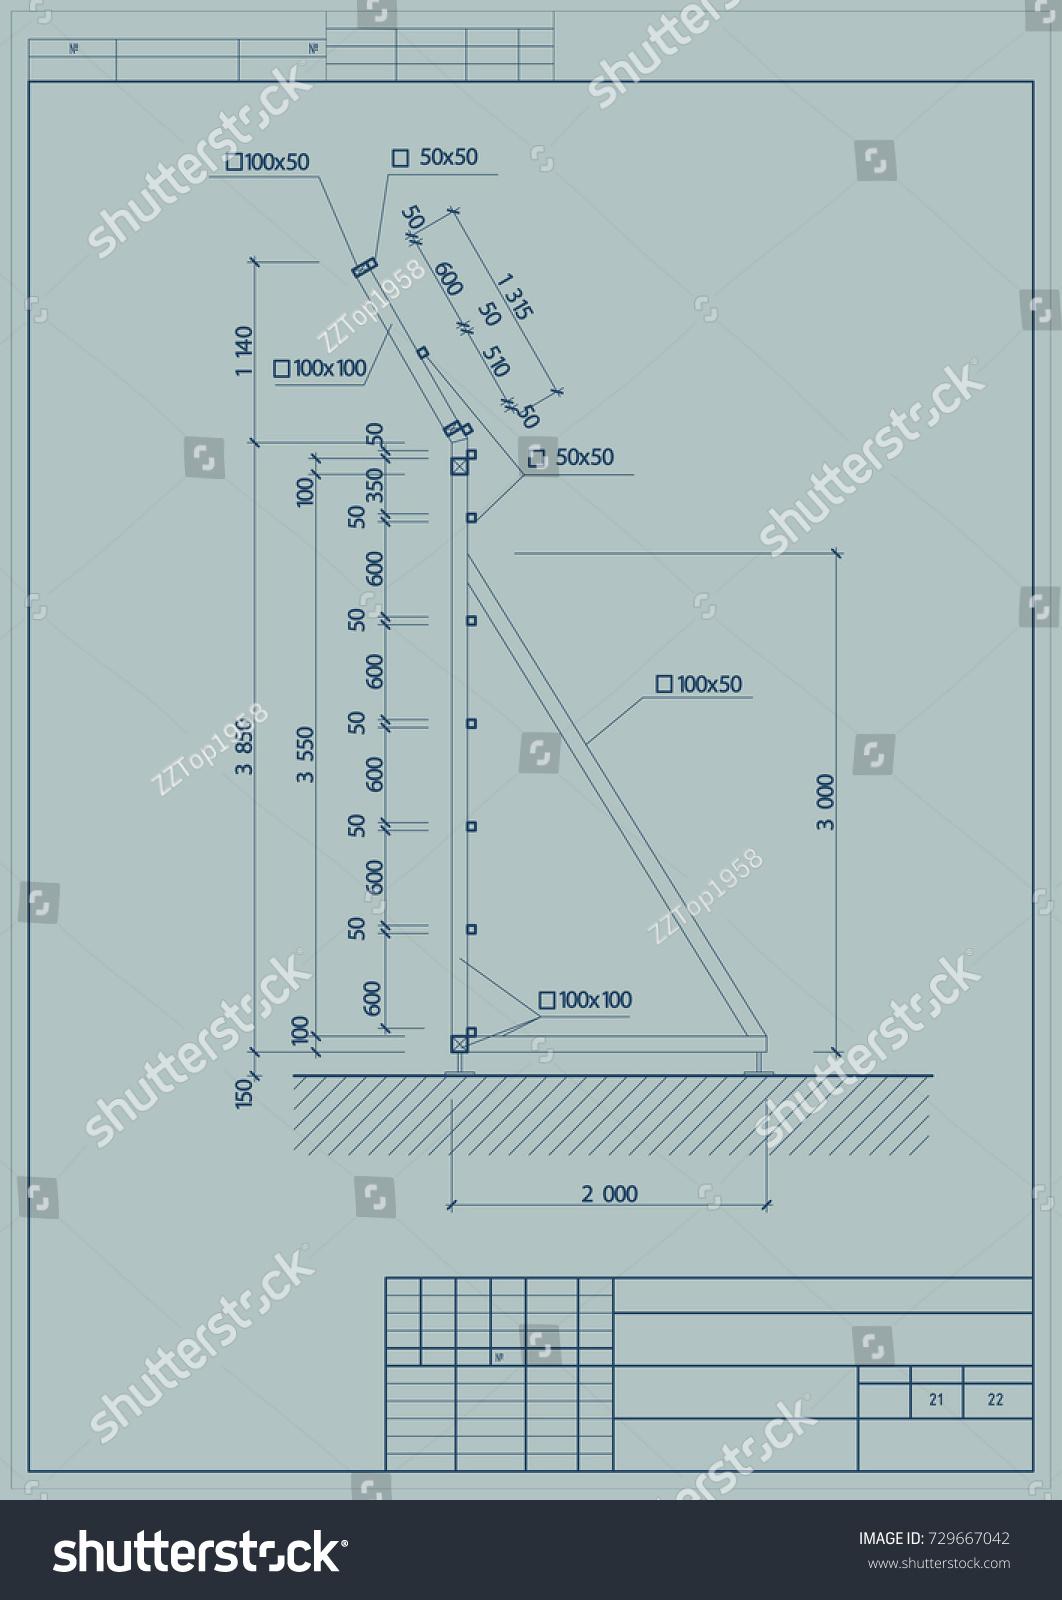 Architectural design engineering equipment elevation blueprint stock the architectural design of the engineering equipment elevation blueprint vector malvernweather Images